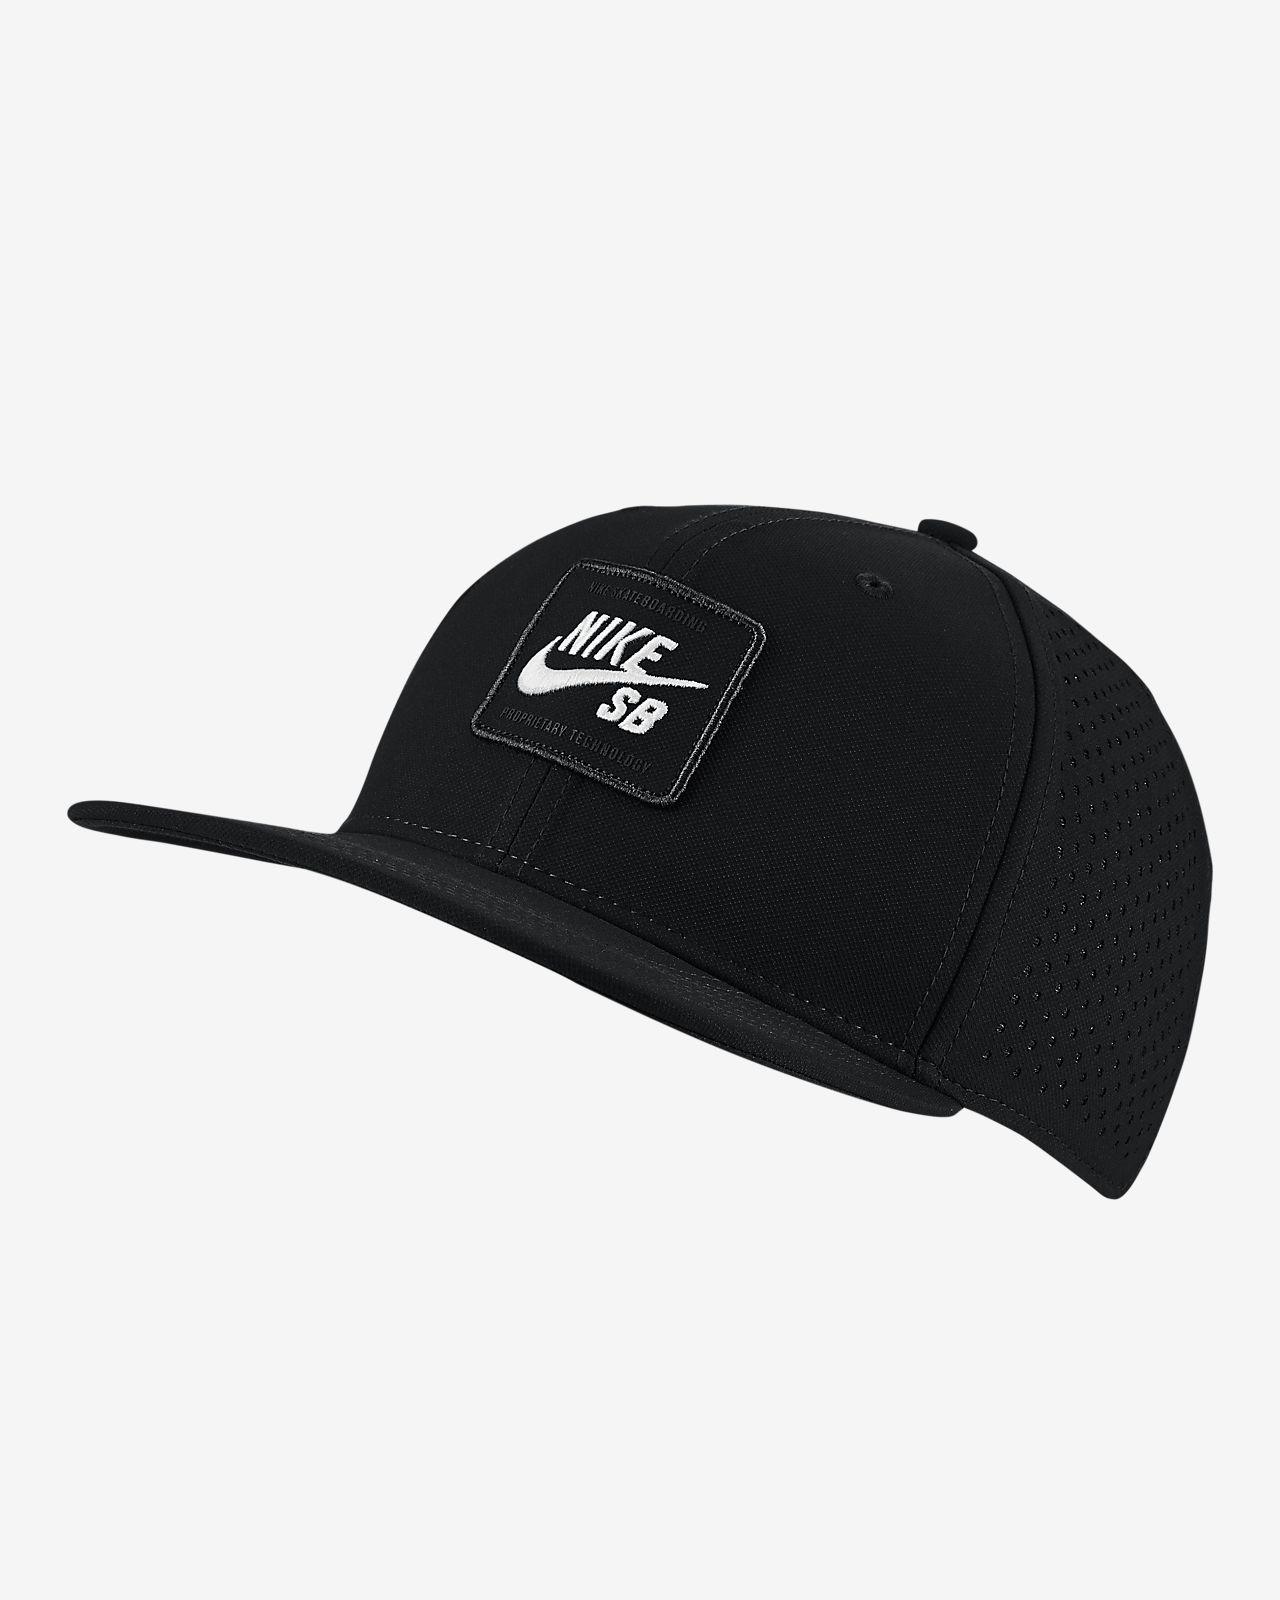 Nike SB AeroBill Pro 2.0 Skate Hat